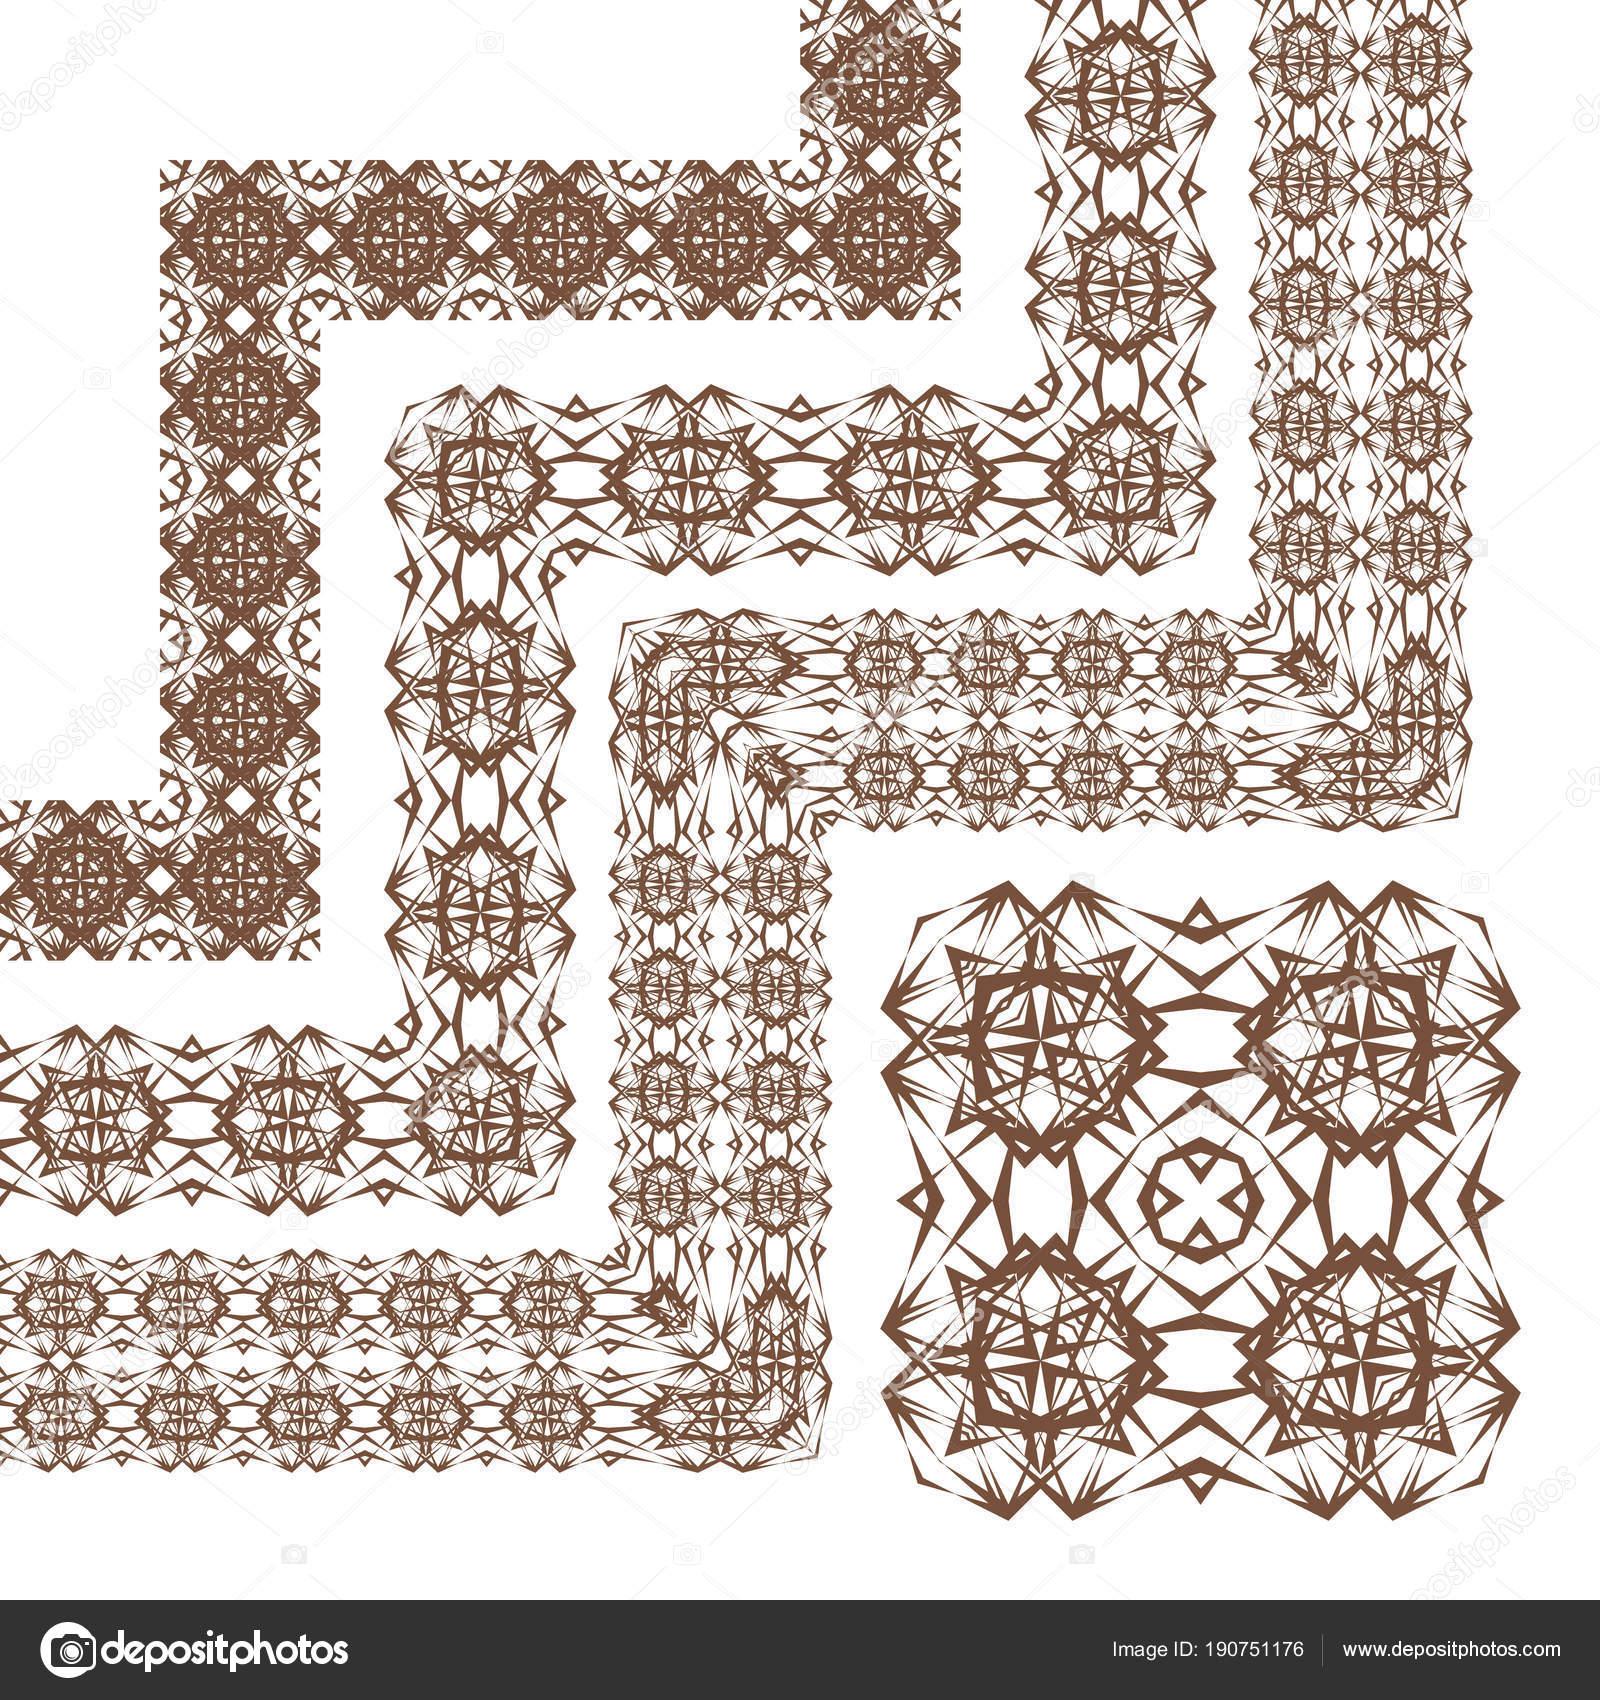 Download Decorative Border Frame Elements Corners Vector Modern Design Creative Geometric Stock Vector C Khaladok 190751176